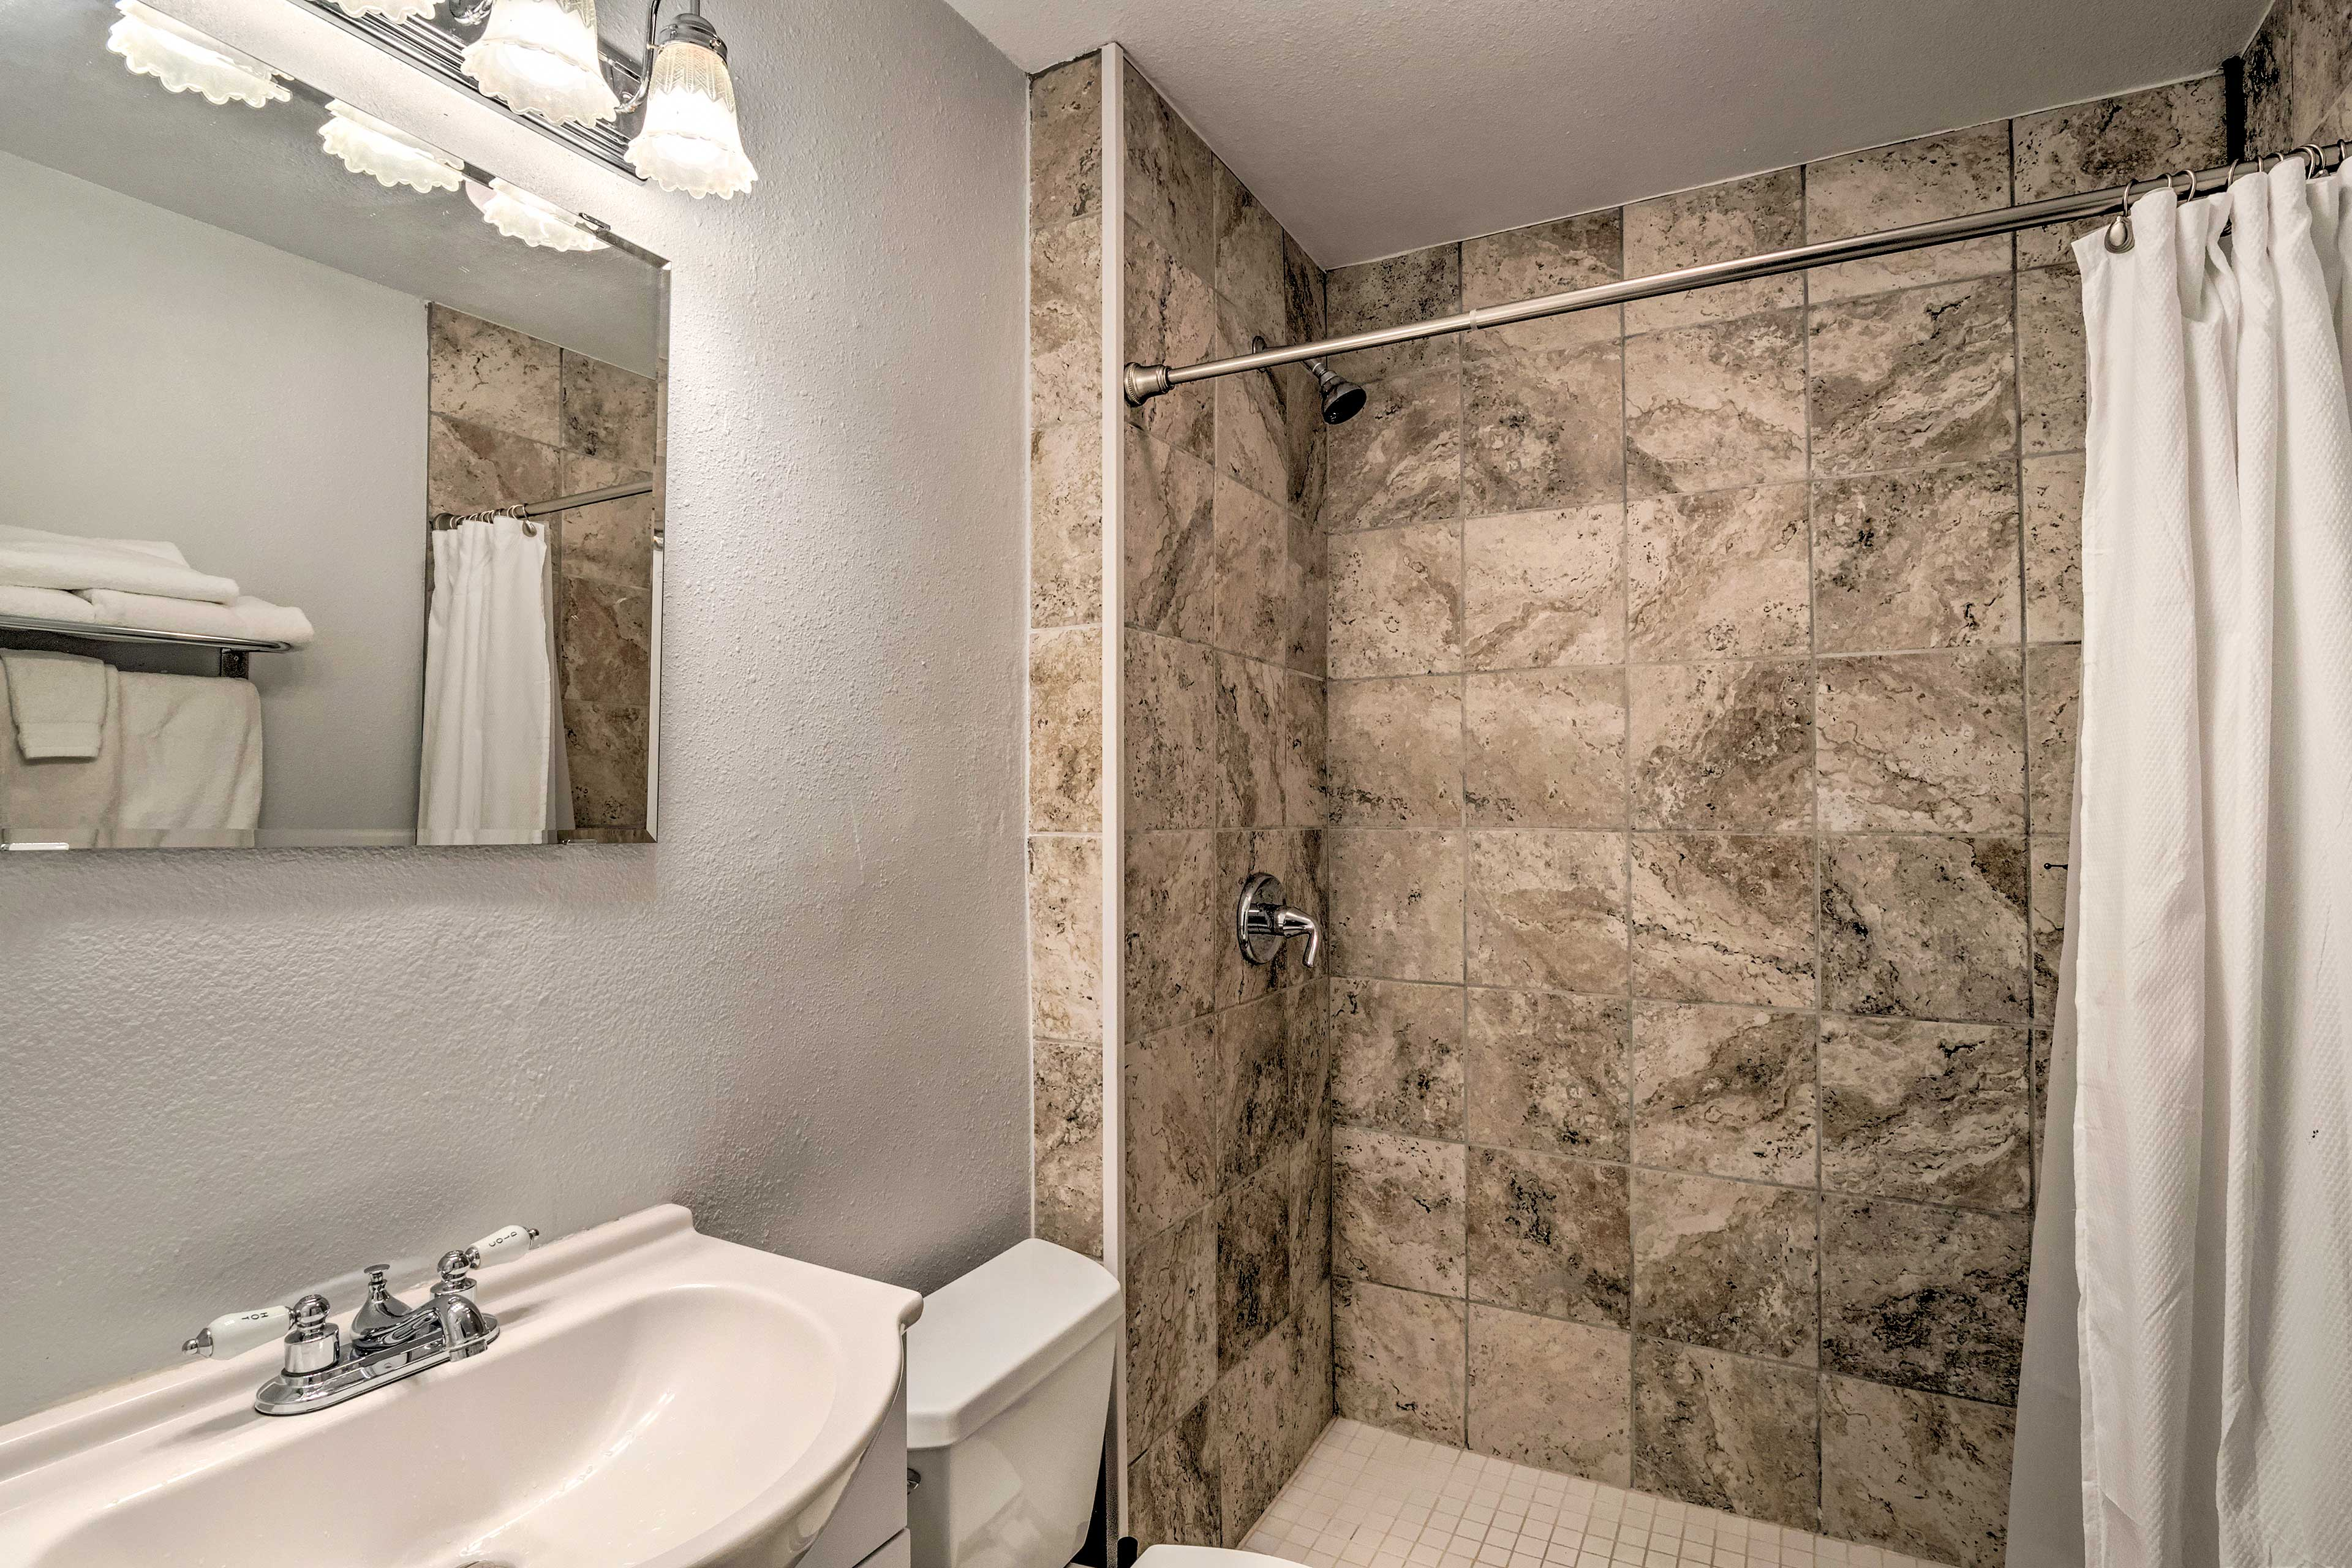 The en-suite bathroom will suit all your needs!